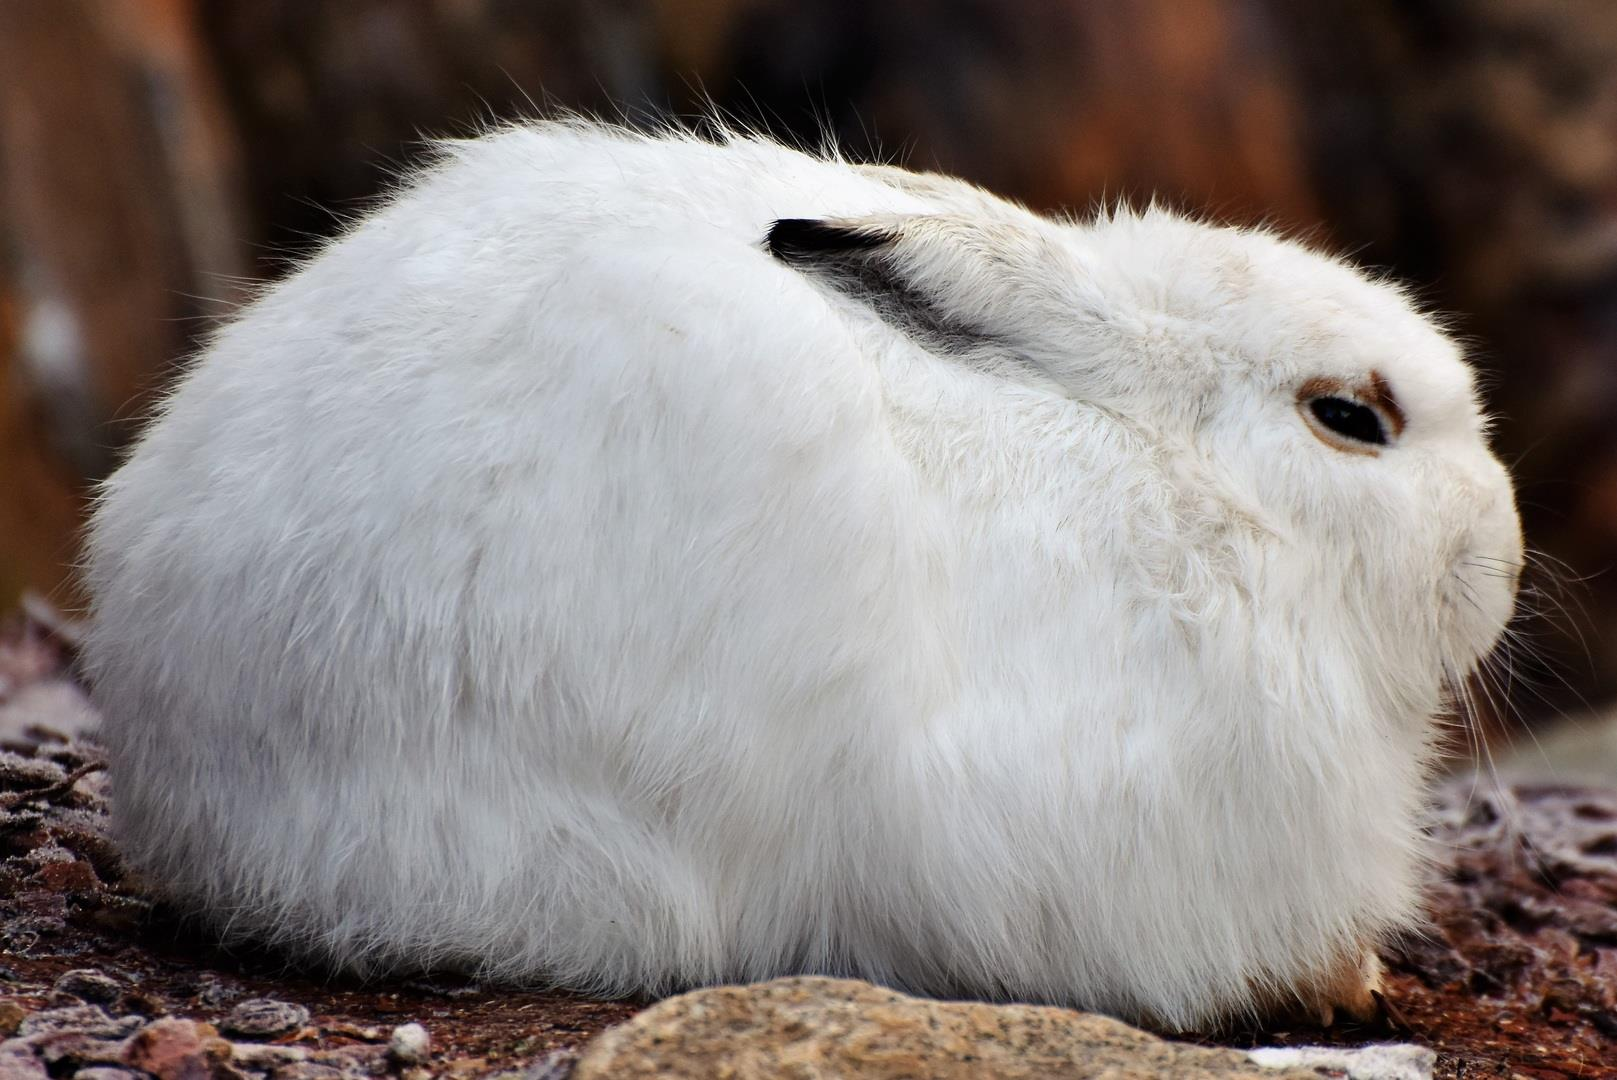 животное заяц фото